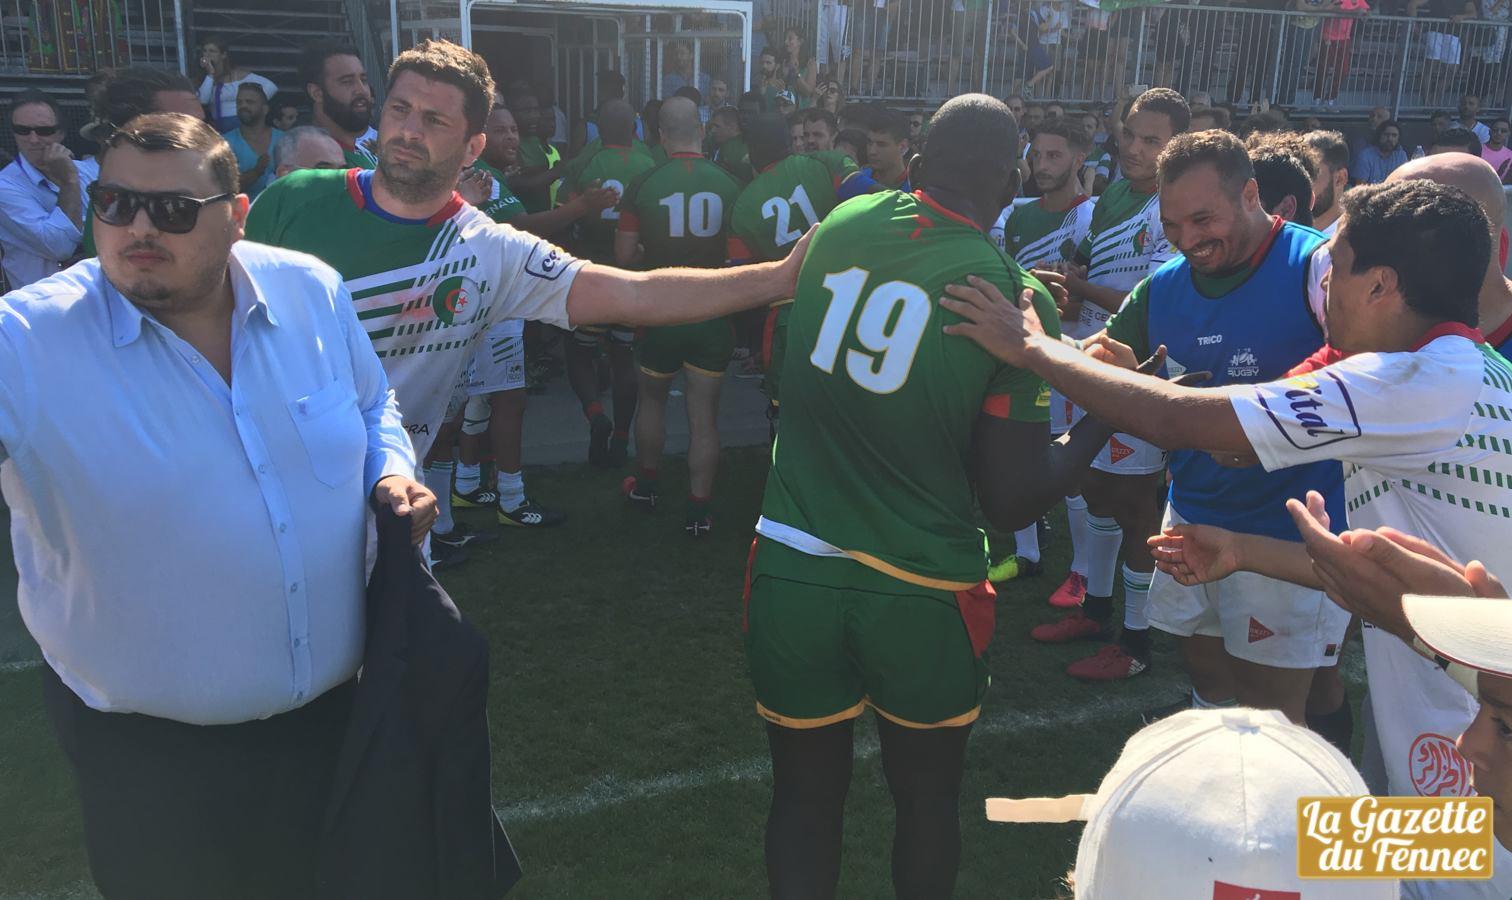 haie honneur silver cup algerie senegal rugby toulouse